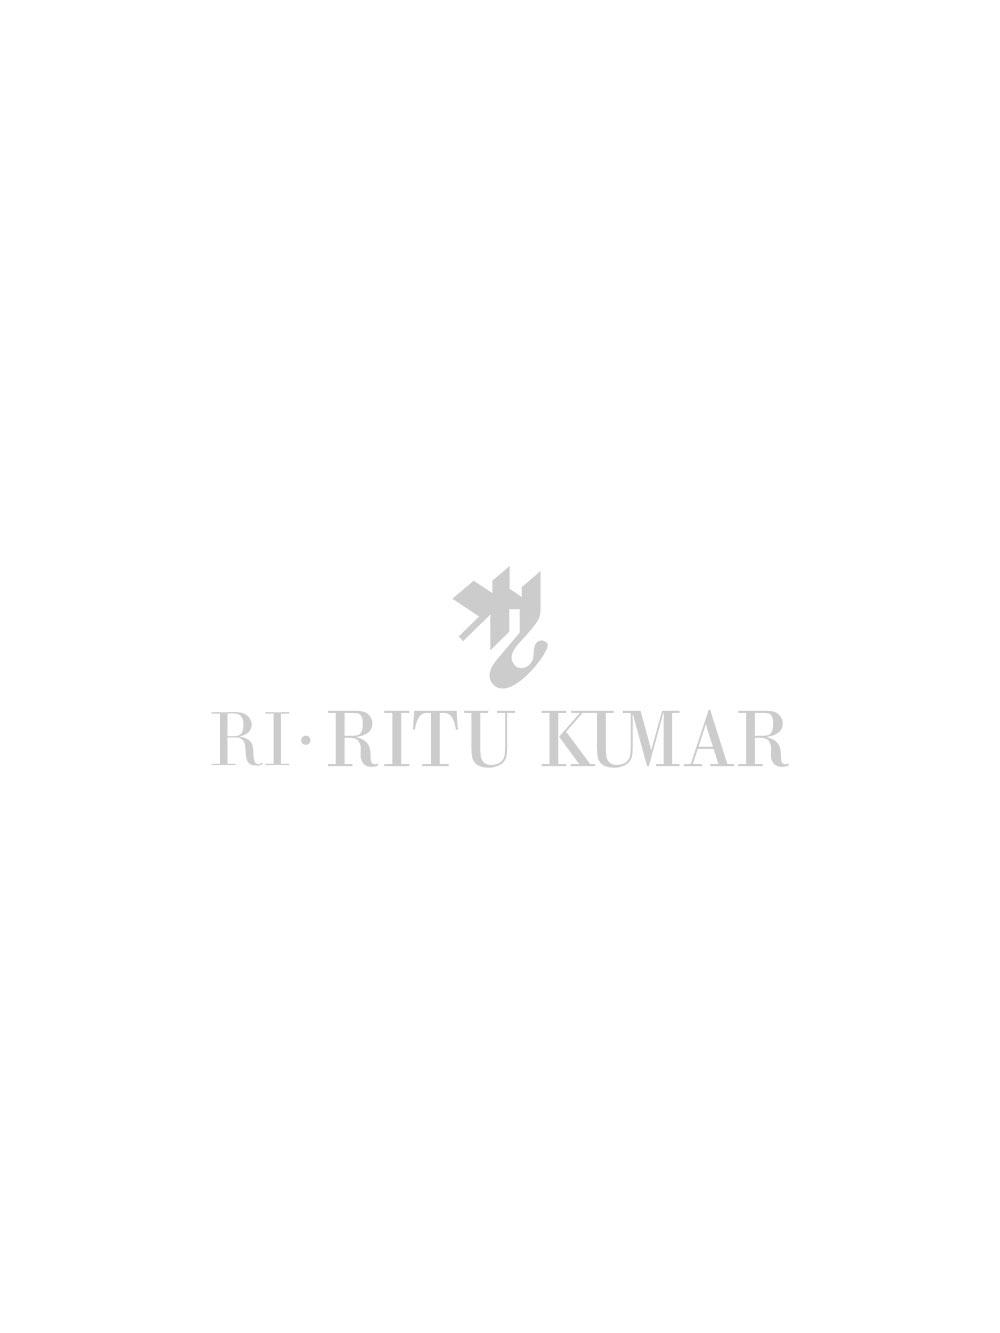 Sequins Net Embroidery Saree By Ritu Kumar